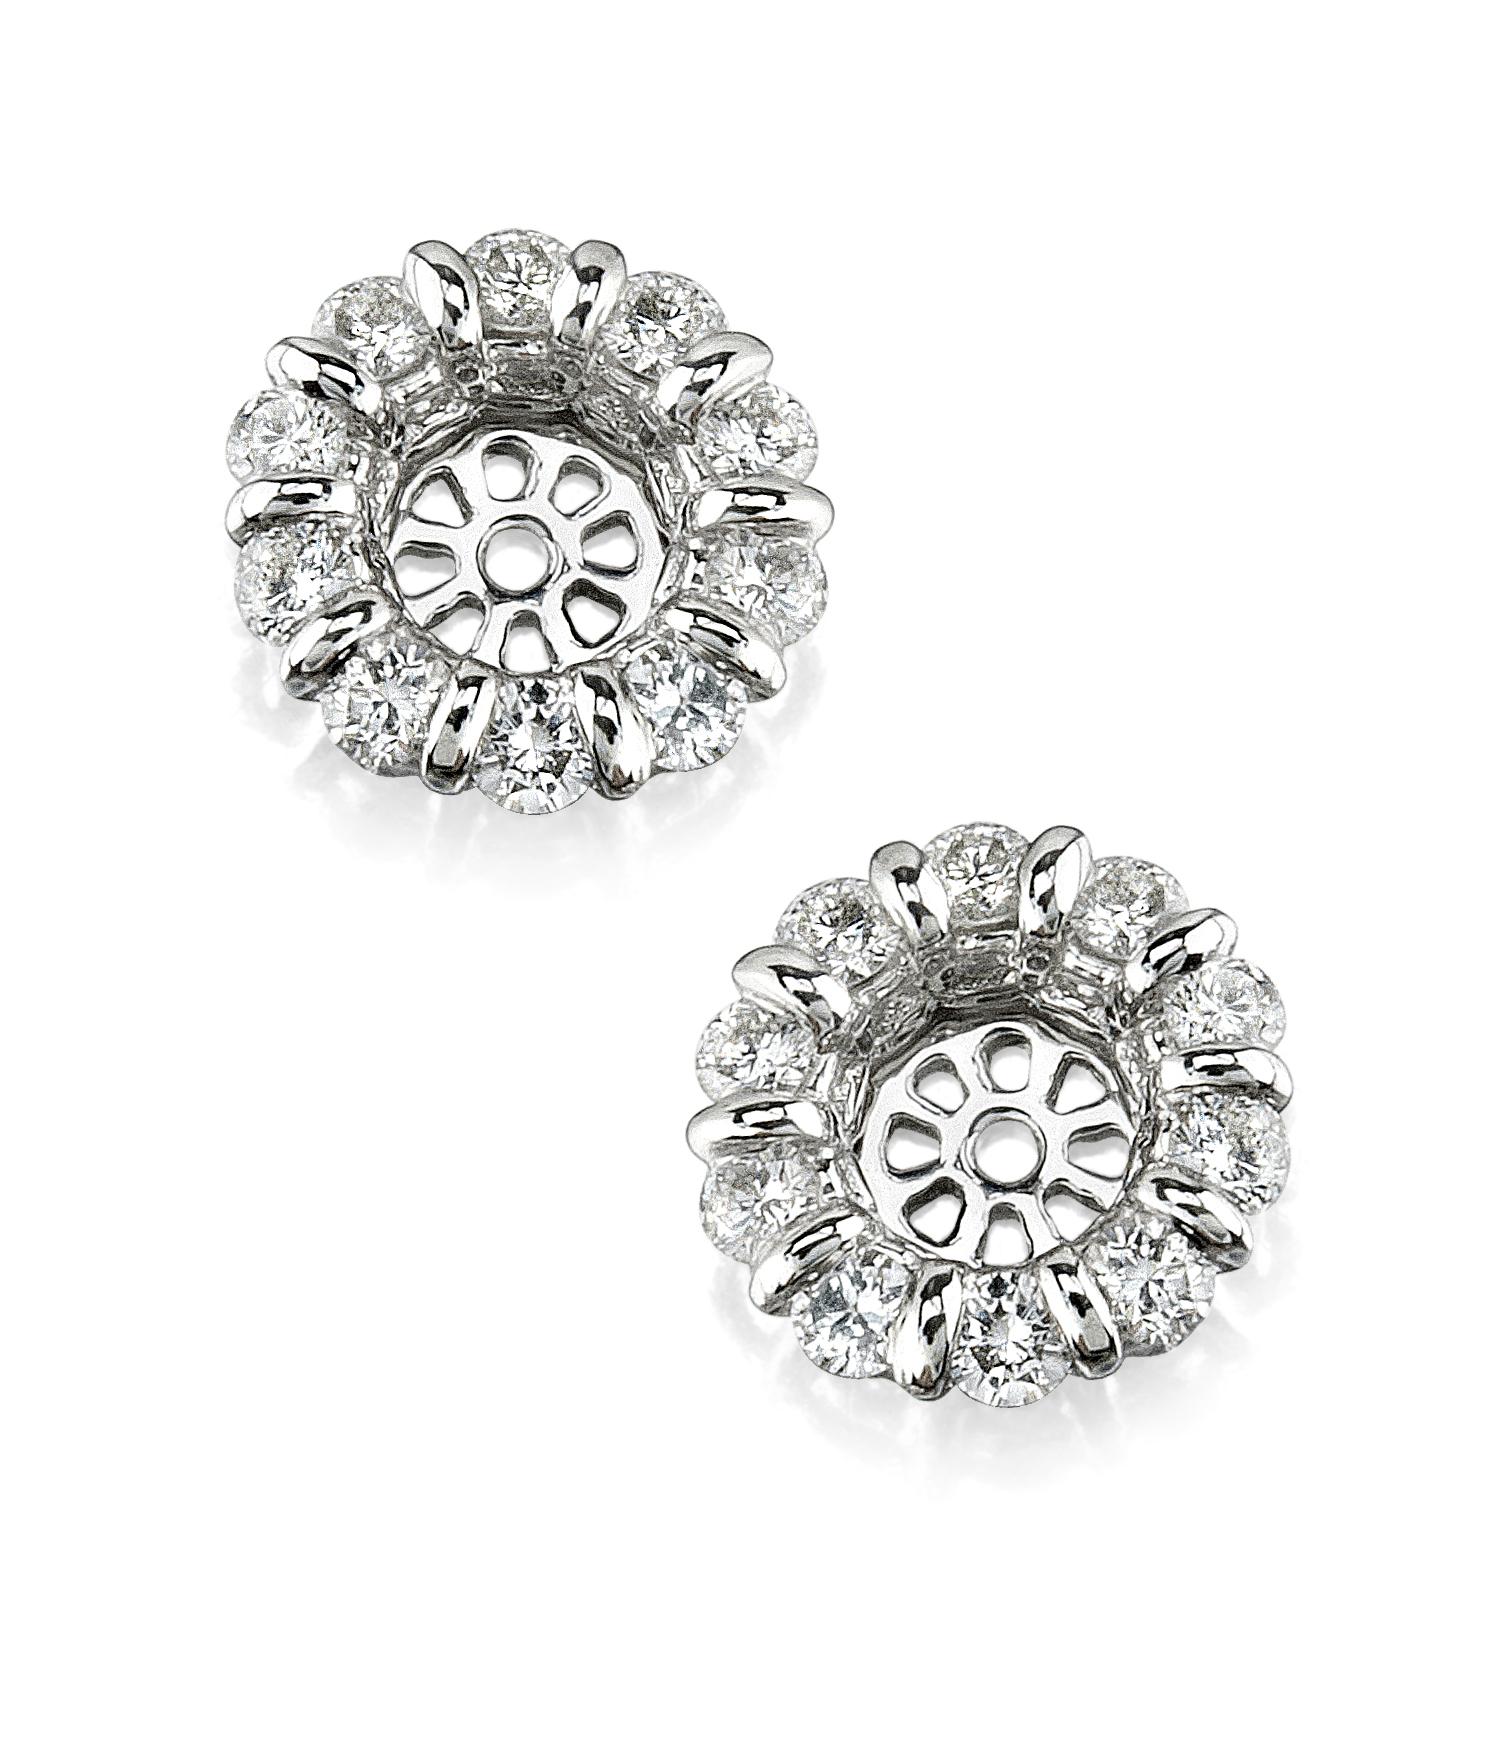 Diamond Earring Diamond Earring Jackets - The Diamond Guys